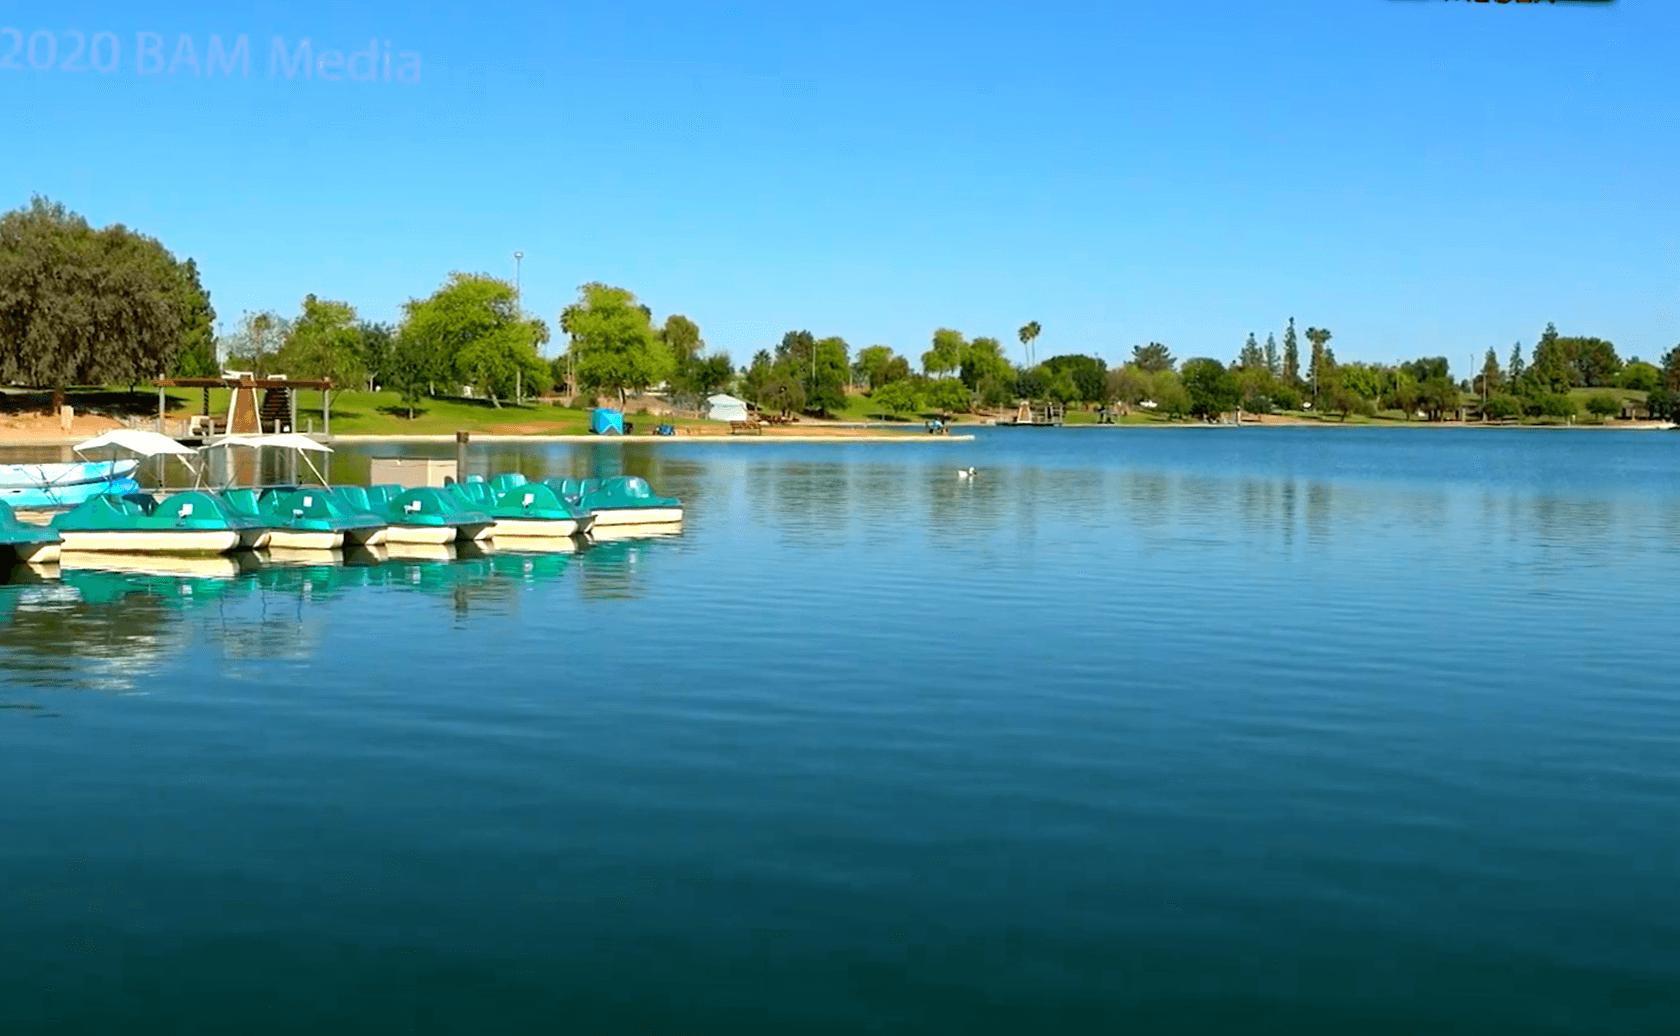 Kiwanis-Lake-Fishing-Guide-Tempe-AZ-06